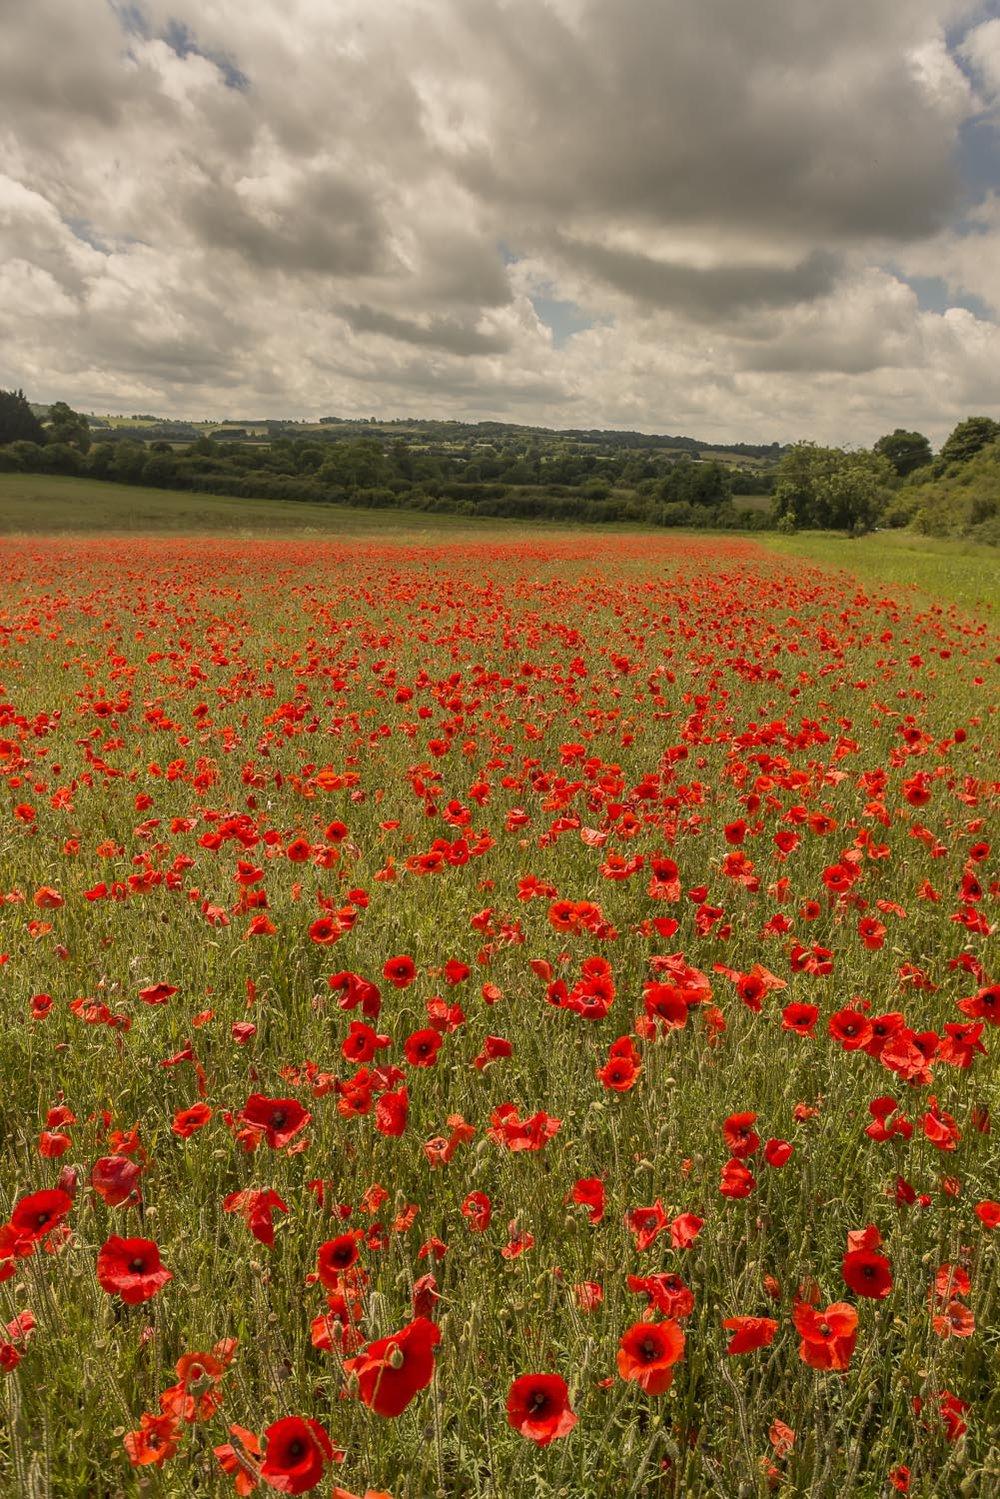 poppies-portrait-Gloucestershire-Jo-Kearney-photos-landscape-photography-video-landscapes.jpg